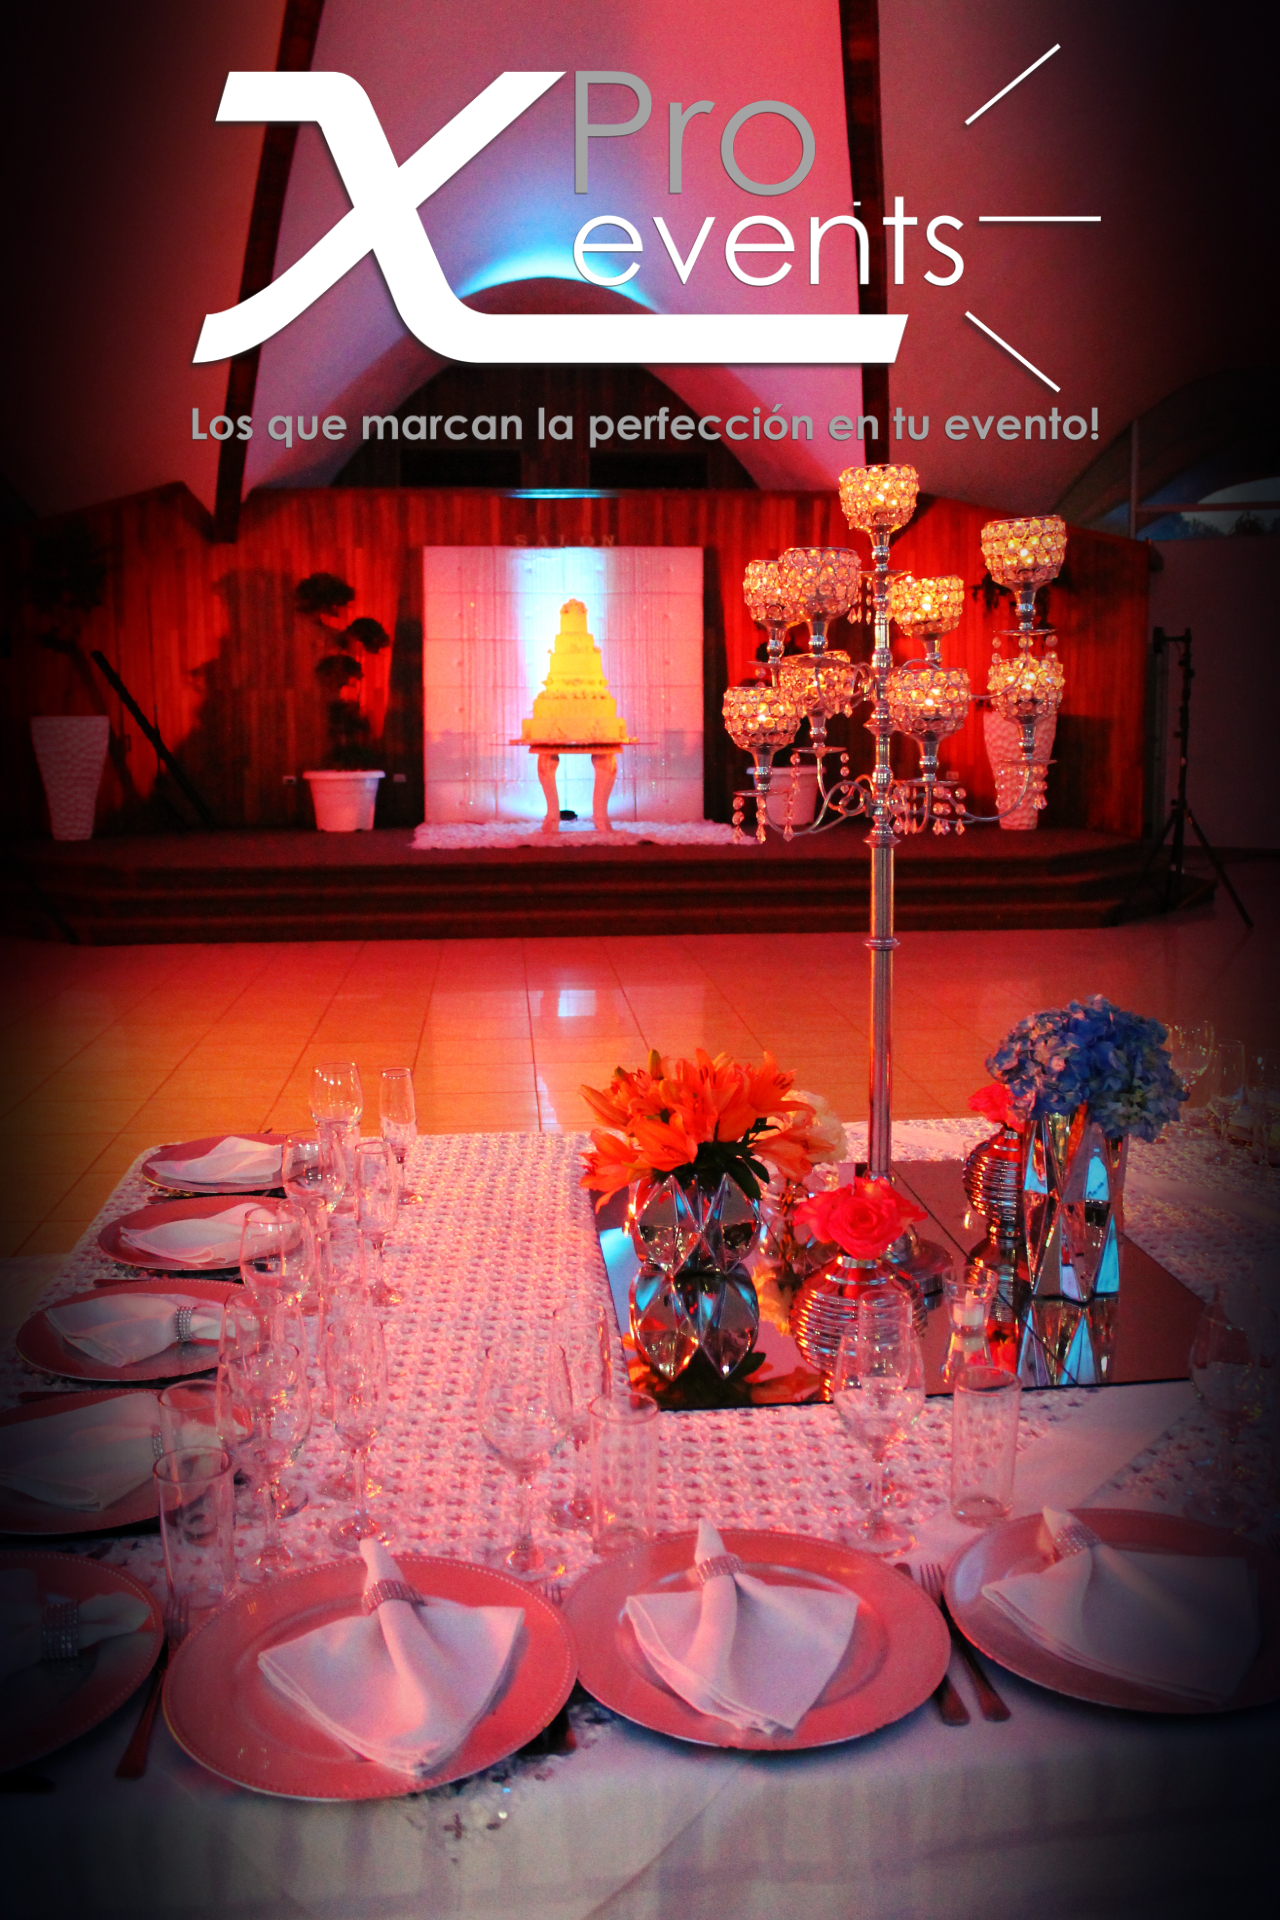 www.Xproevents.com - Completa la decoracion con iluminacion LED.JPG